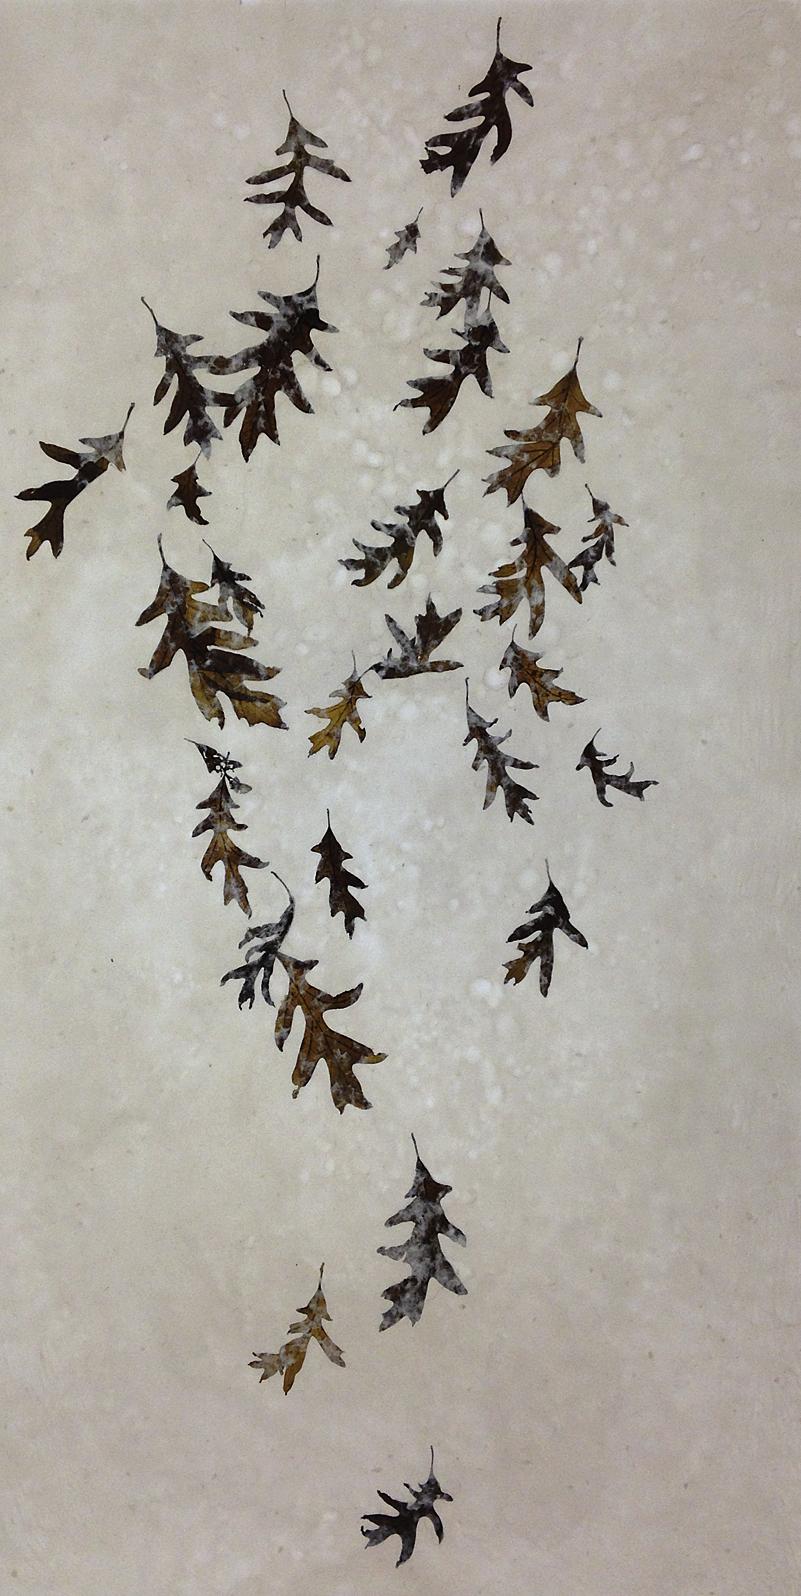 Autumn moment 2 - Leaf Relic Series